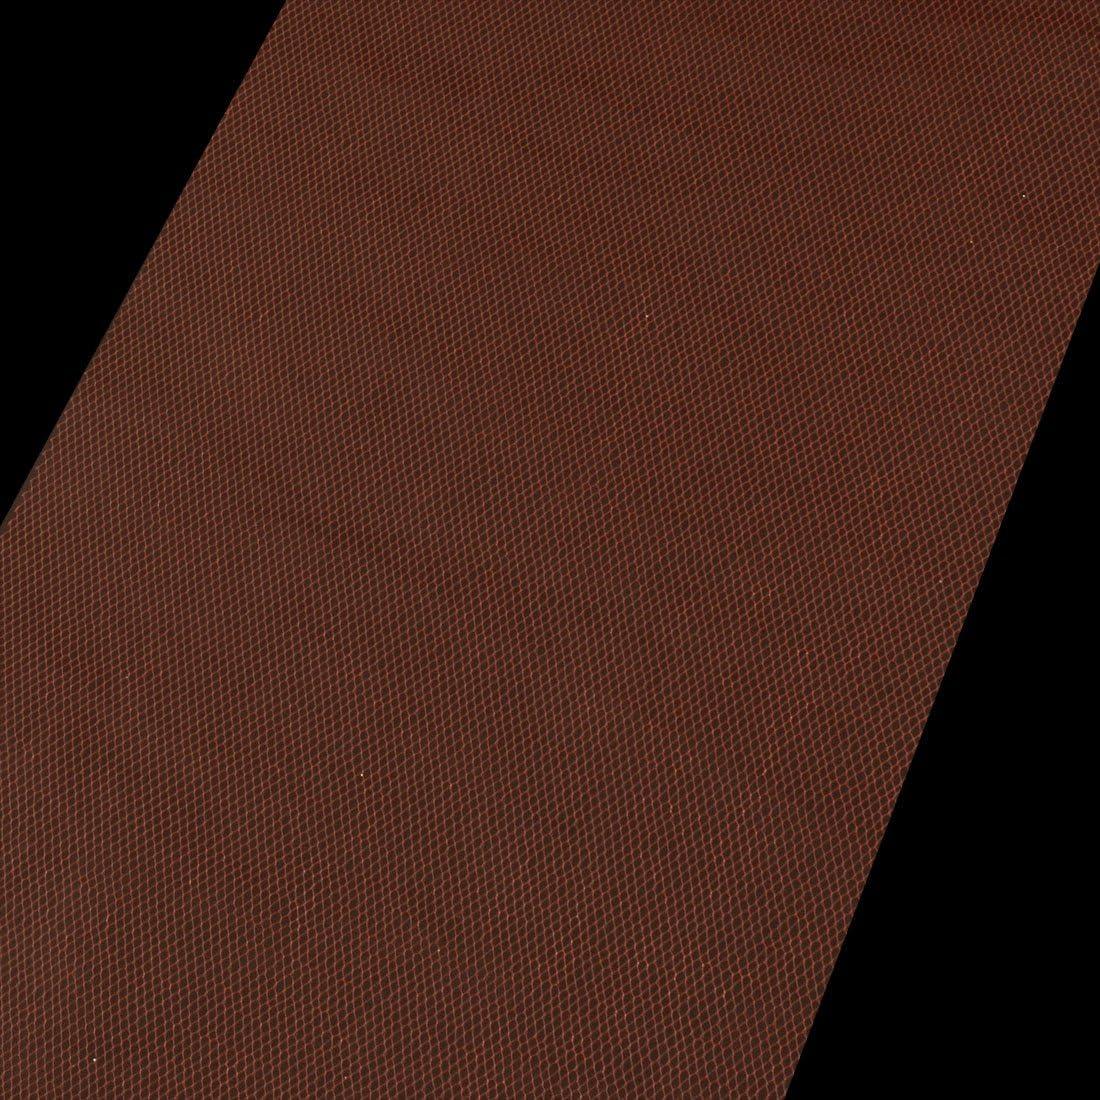 uxcellPolyester Family Wedding Dress Tutu Gift Decor DIY Craft Tulle Spool Roll 6 Inch x 100 Yards Purple